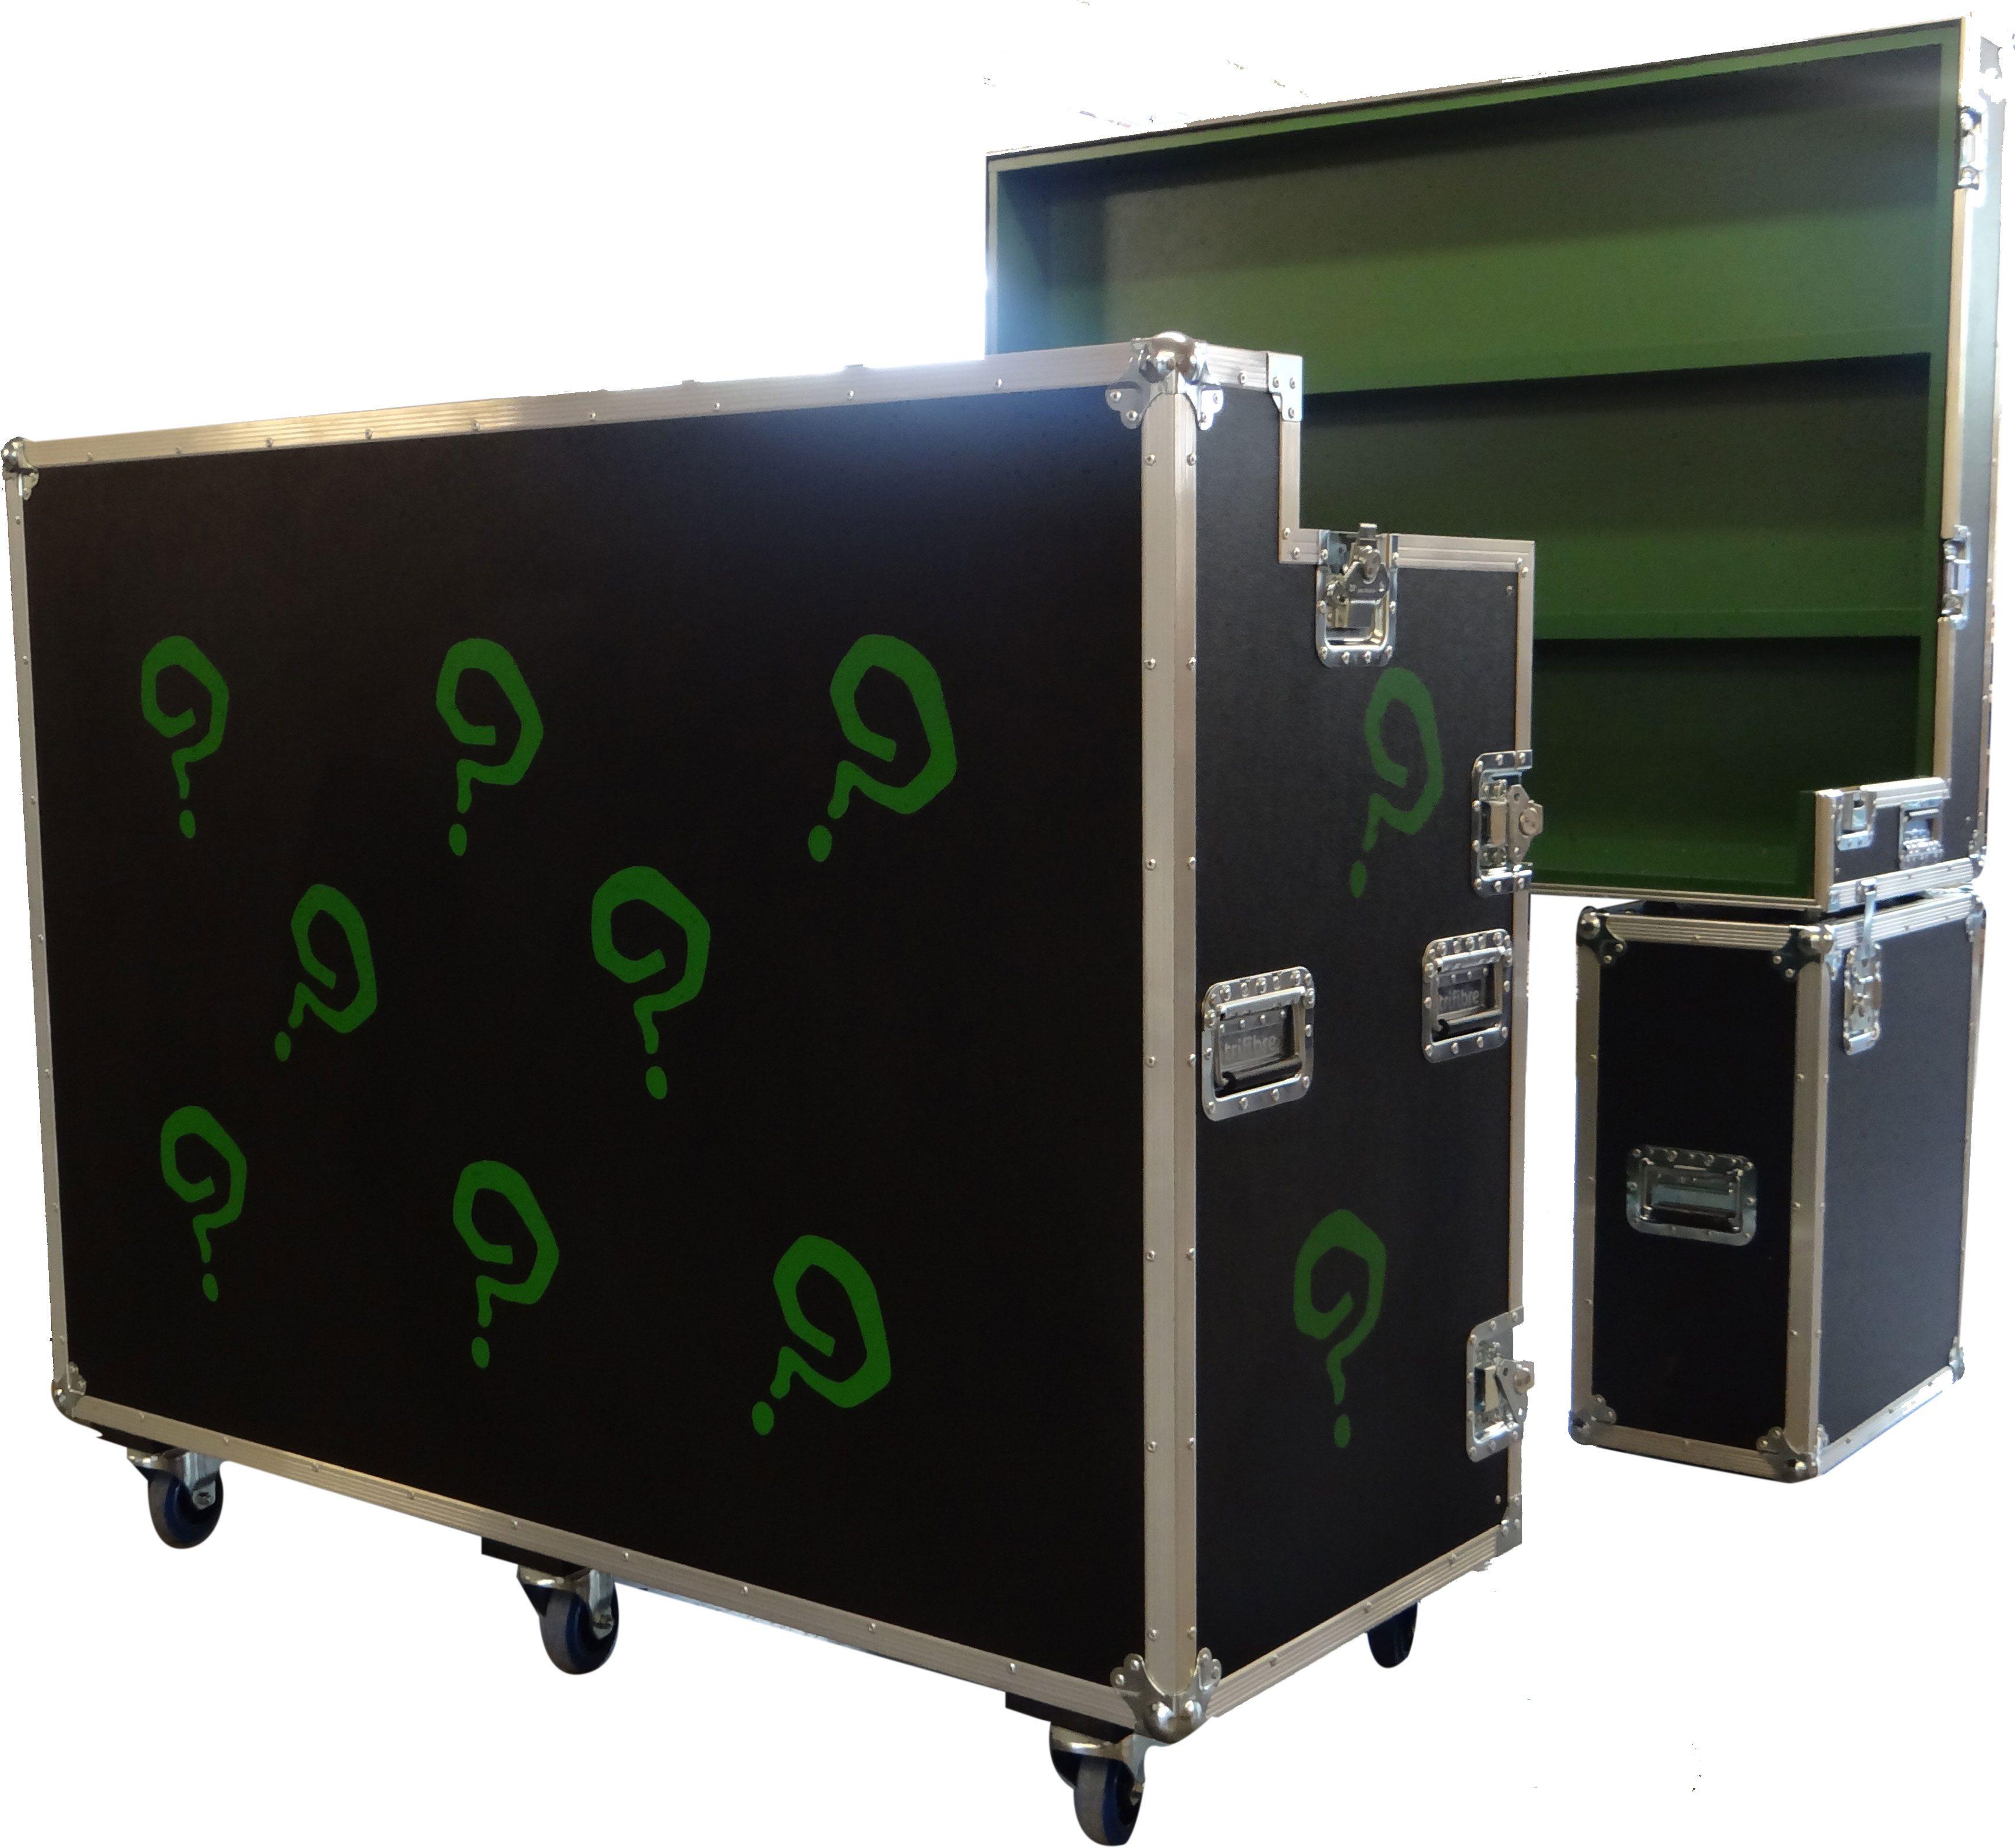 portable bar flight case flight cases waterproof cases. Black Bedroom Furniture Sets. Home Design Ideas